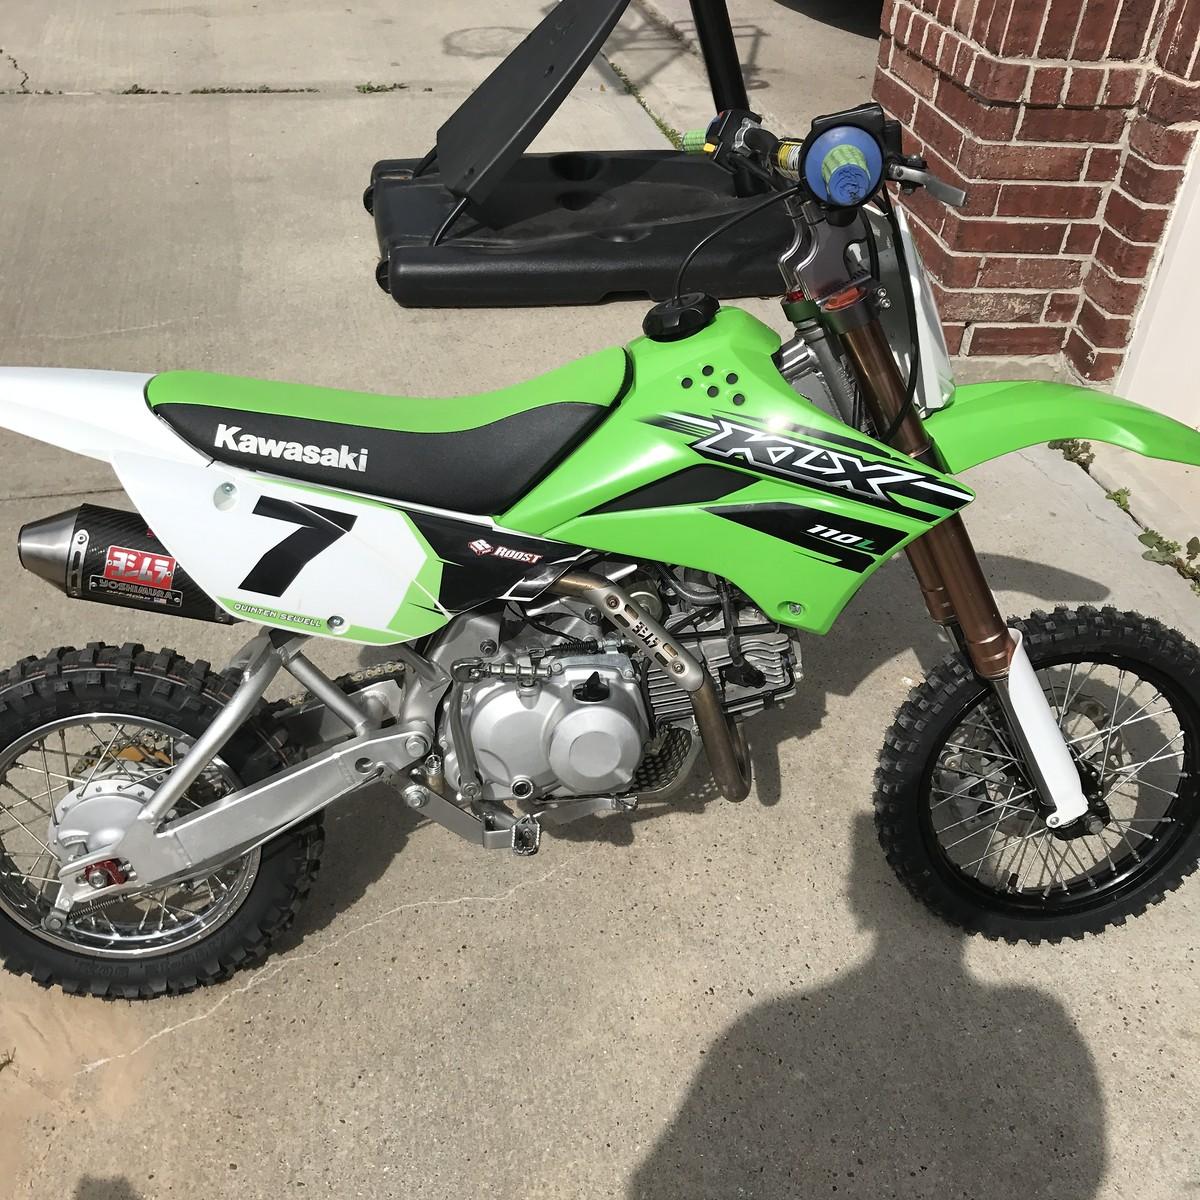 Klx 110 Or 110l For Pitbike Tech Help Race Shop Motocross